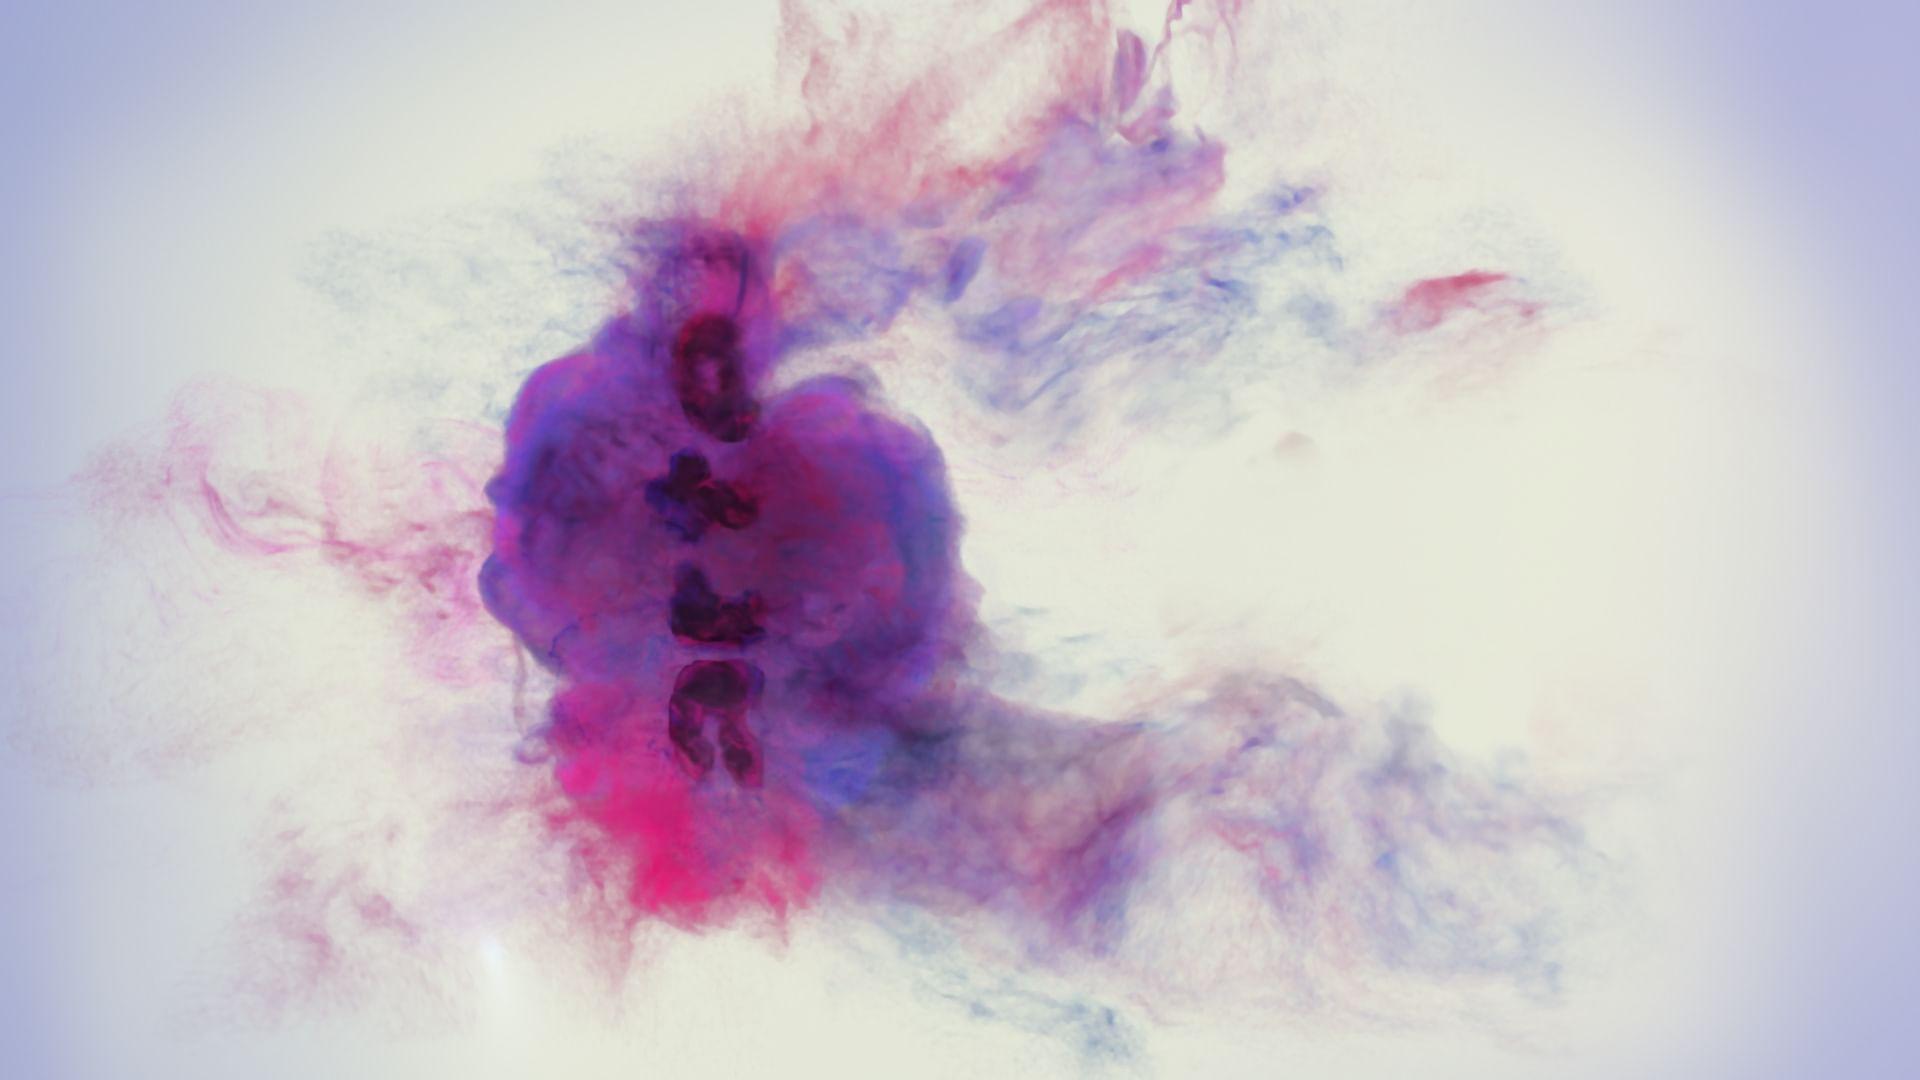 Zombinvasion (1/13) - Zombieland